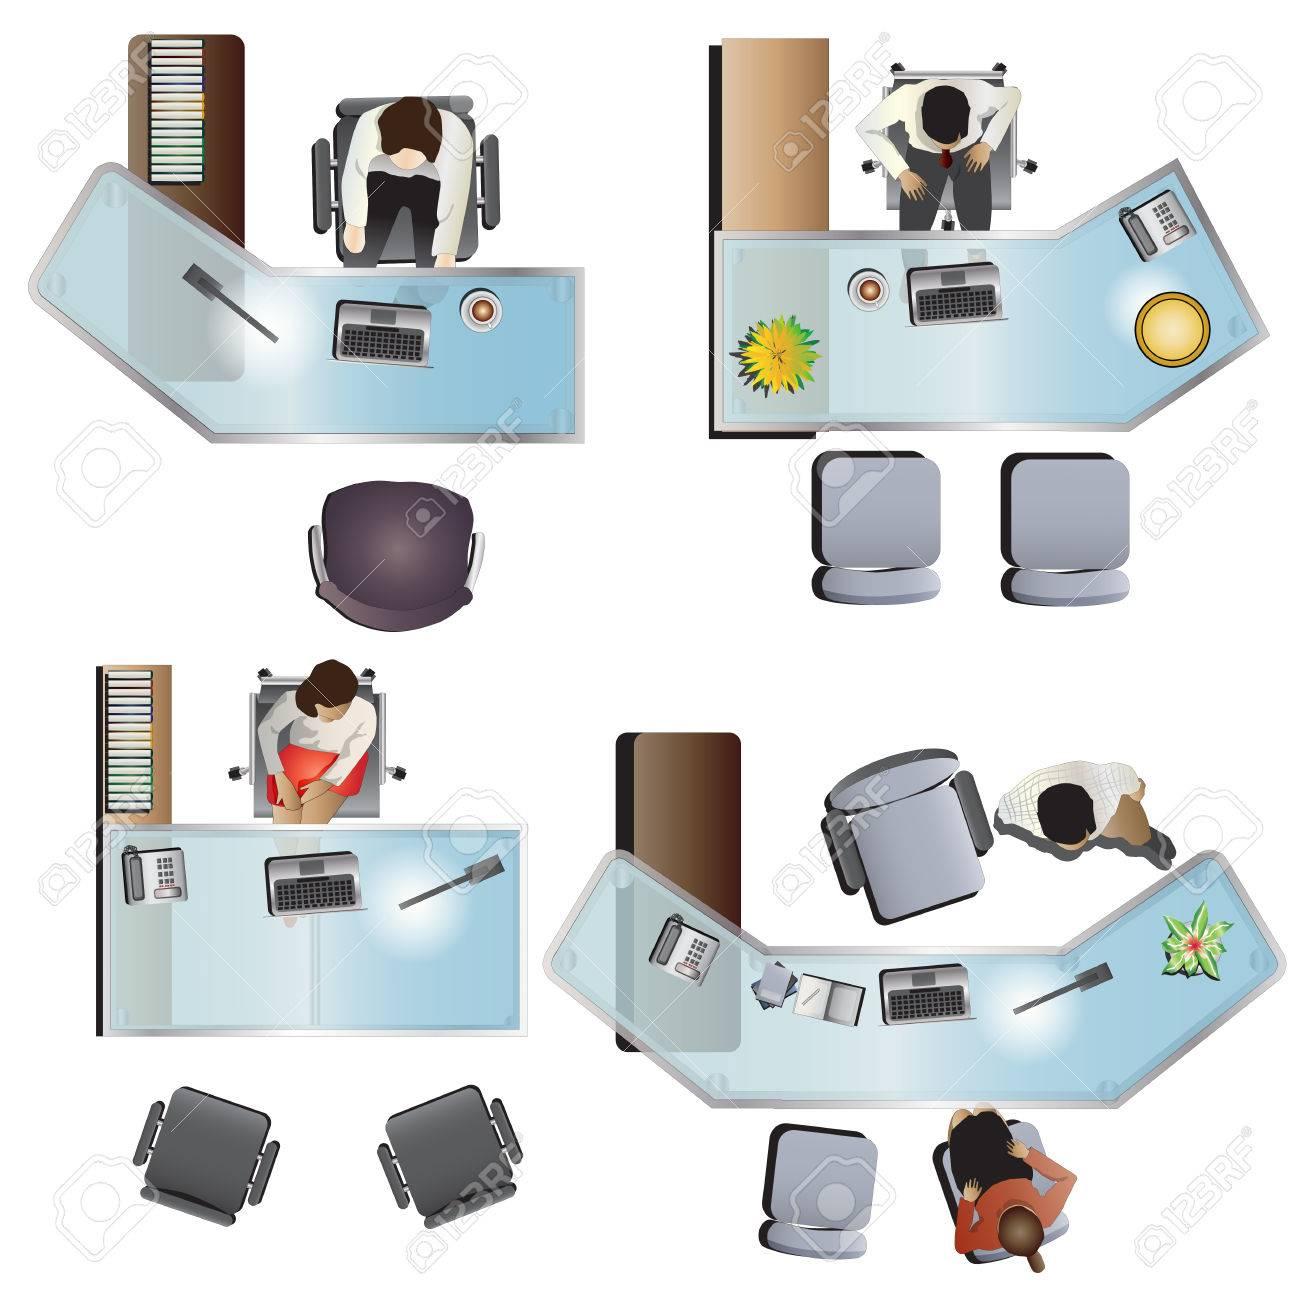 Office furniture top view - Office Furniture Top View Set 7 For Interior Vector Illustration Stock Vector 45841029